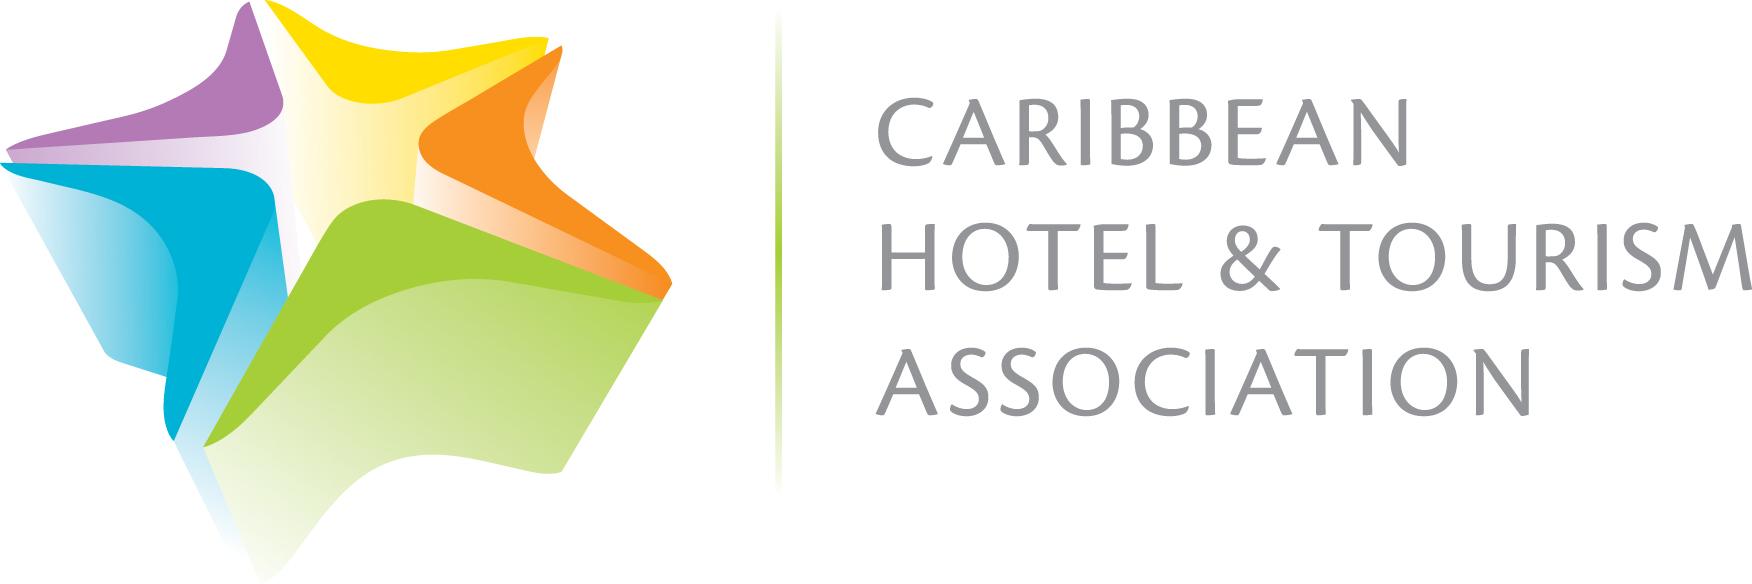 Caribbean Hotel & Tourism Association